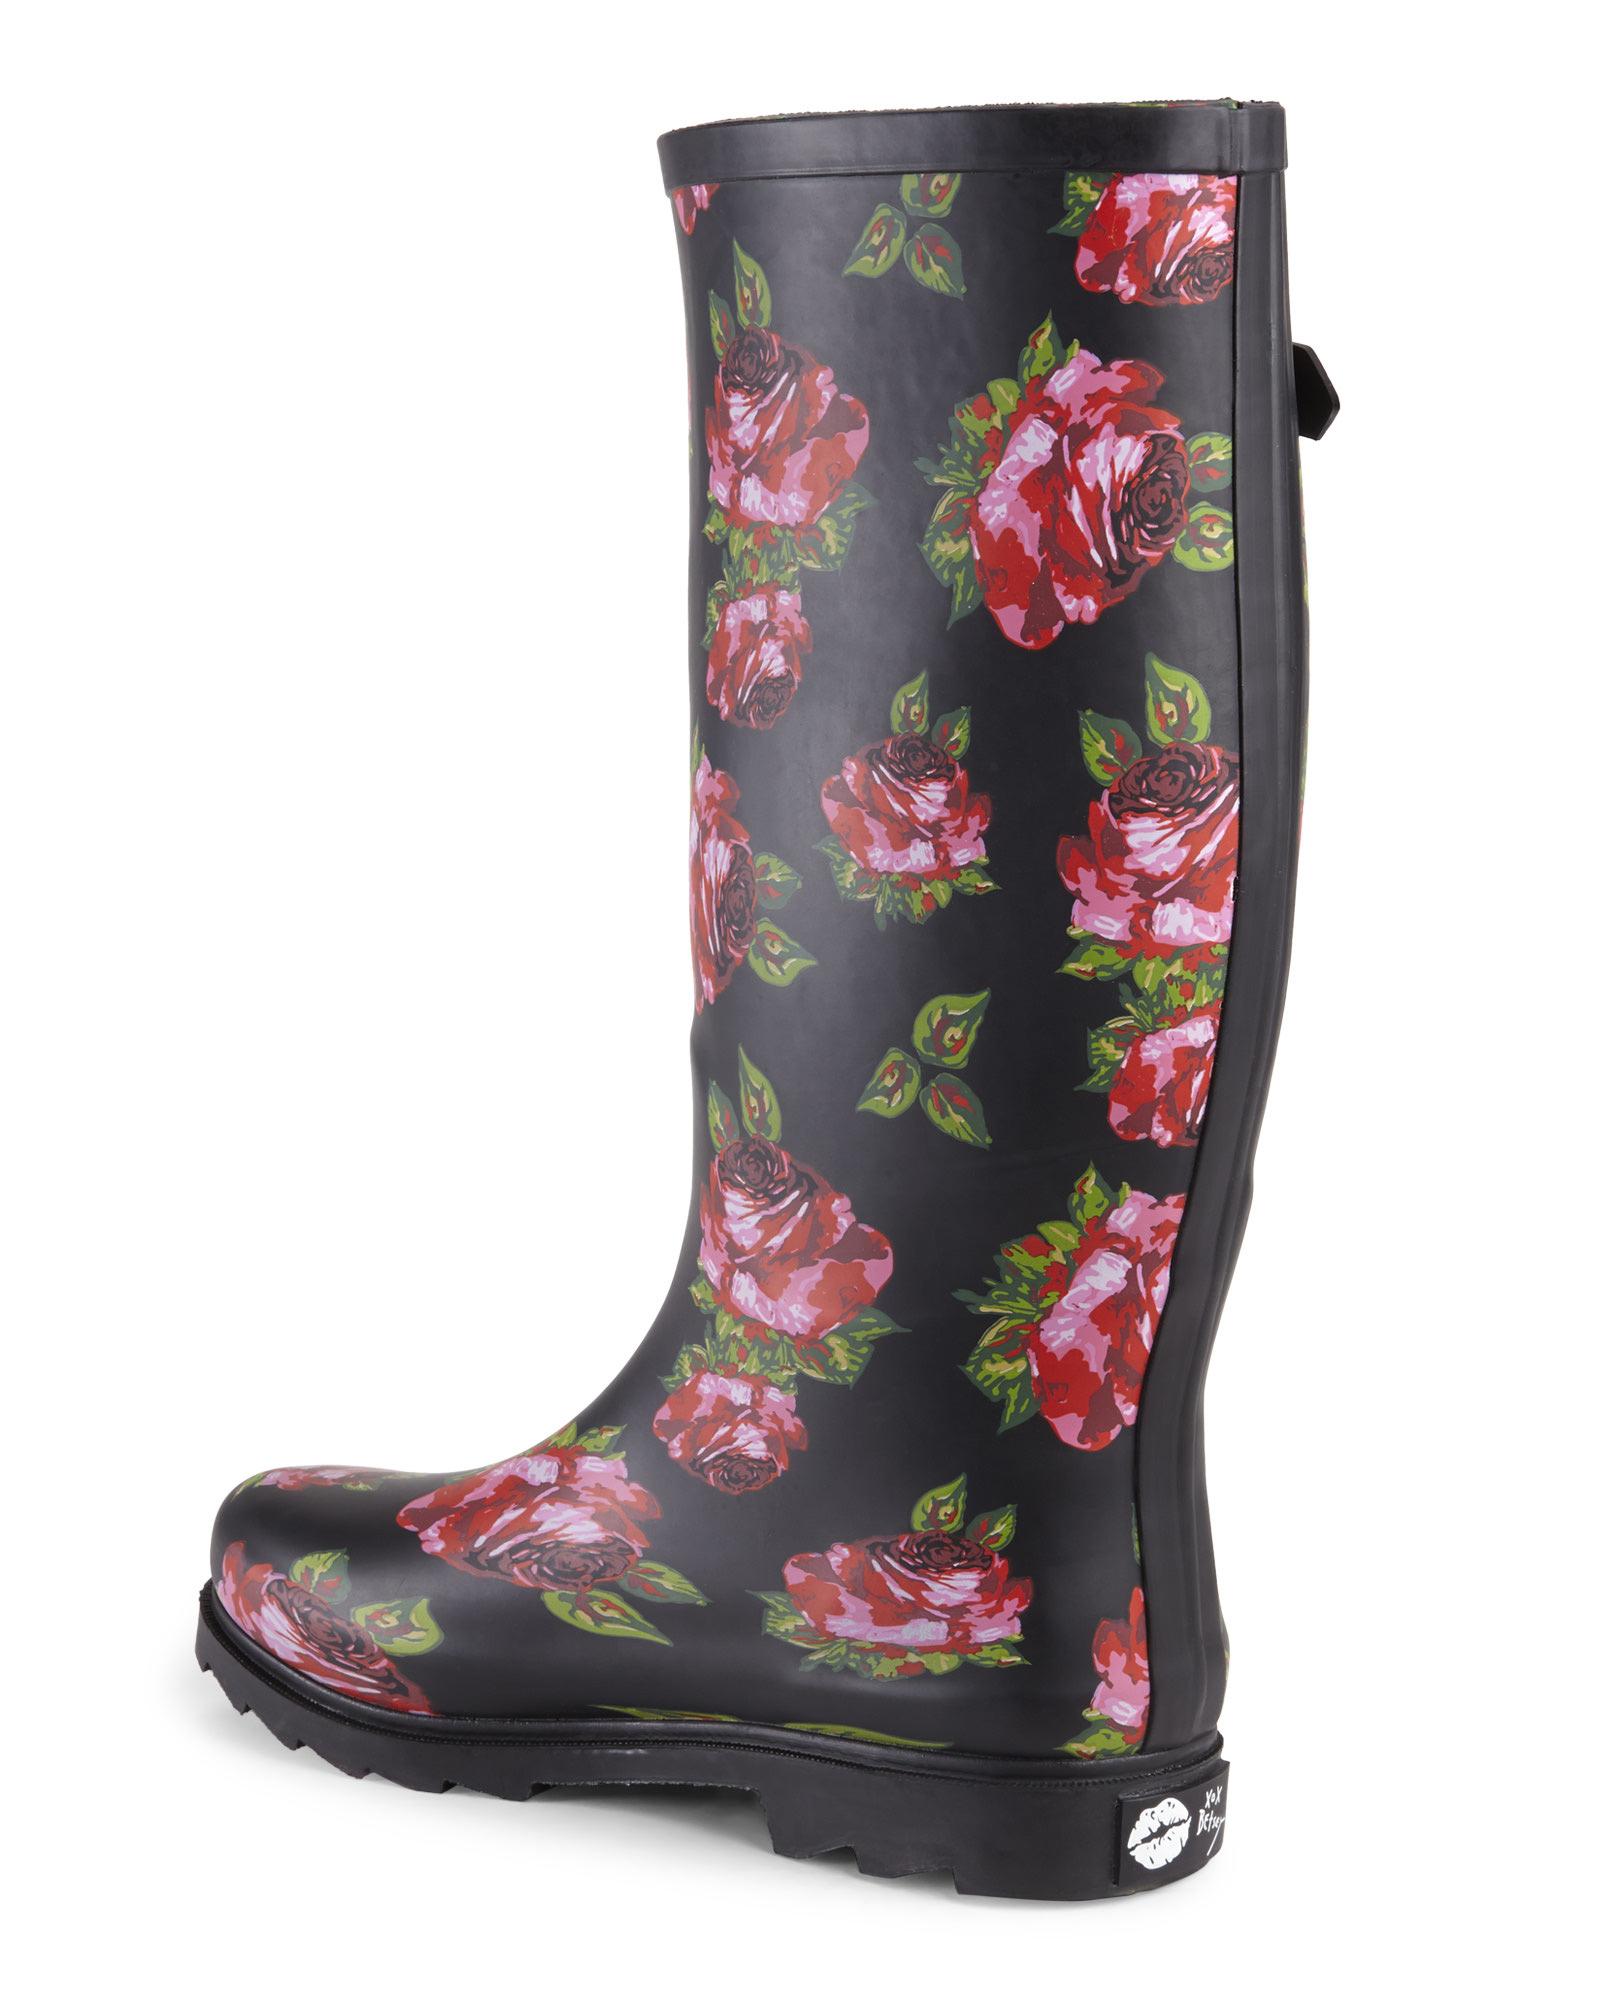 Betsey Johnson Black Floral Drizle Rain Boots Lyst